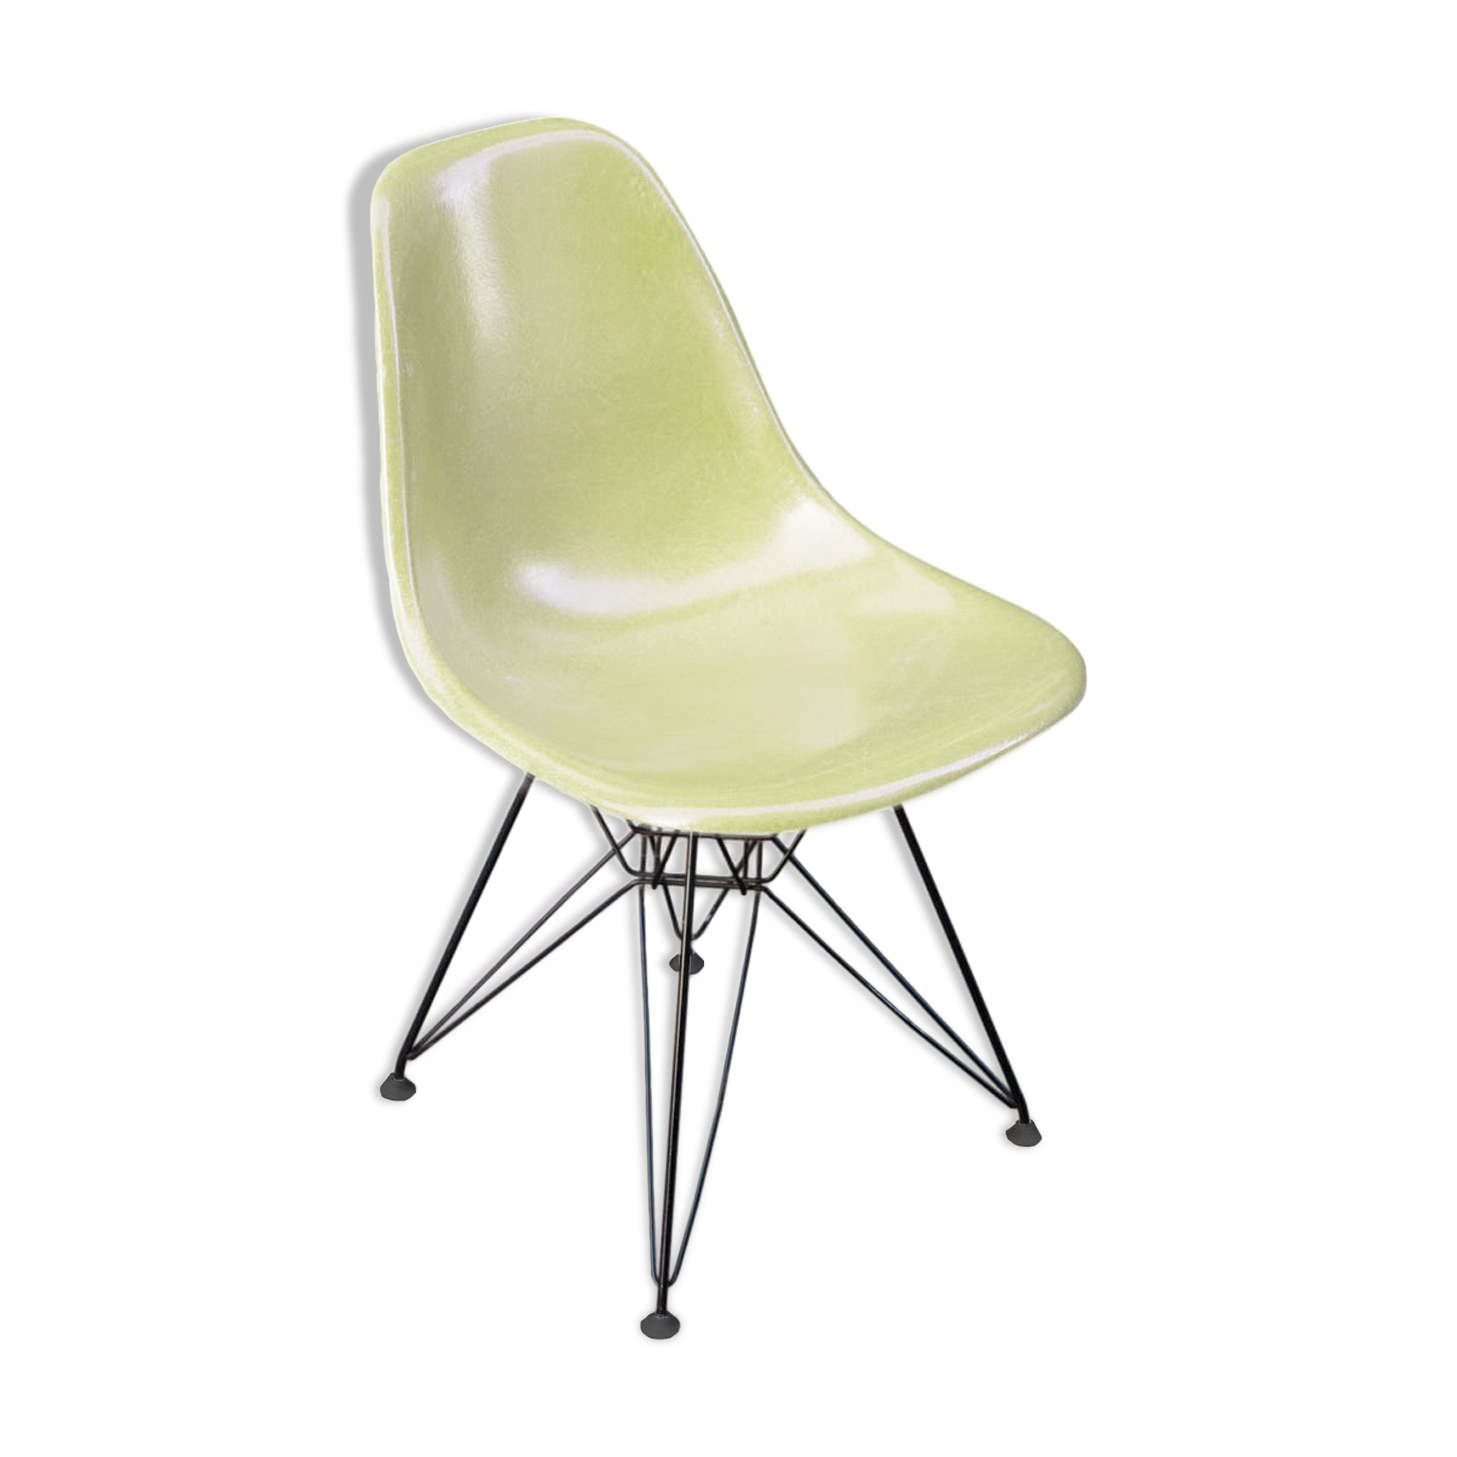 chaises charles et ray eames chaise avec coussin amovible en fil chaise par charles ray et. Black Bedroom Furniture Sets. Home Design Ideas